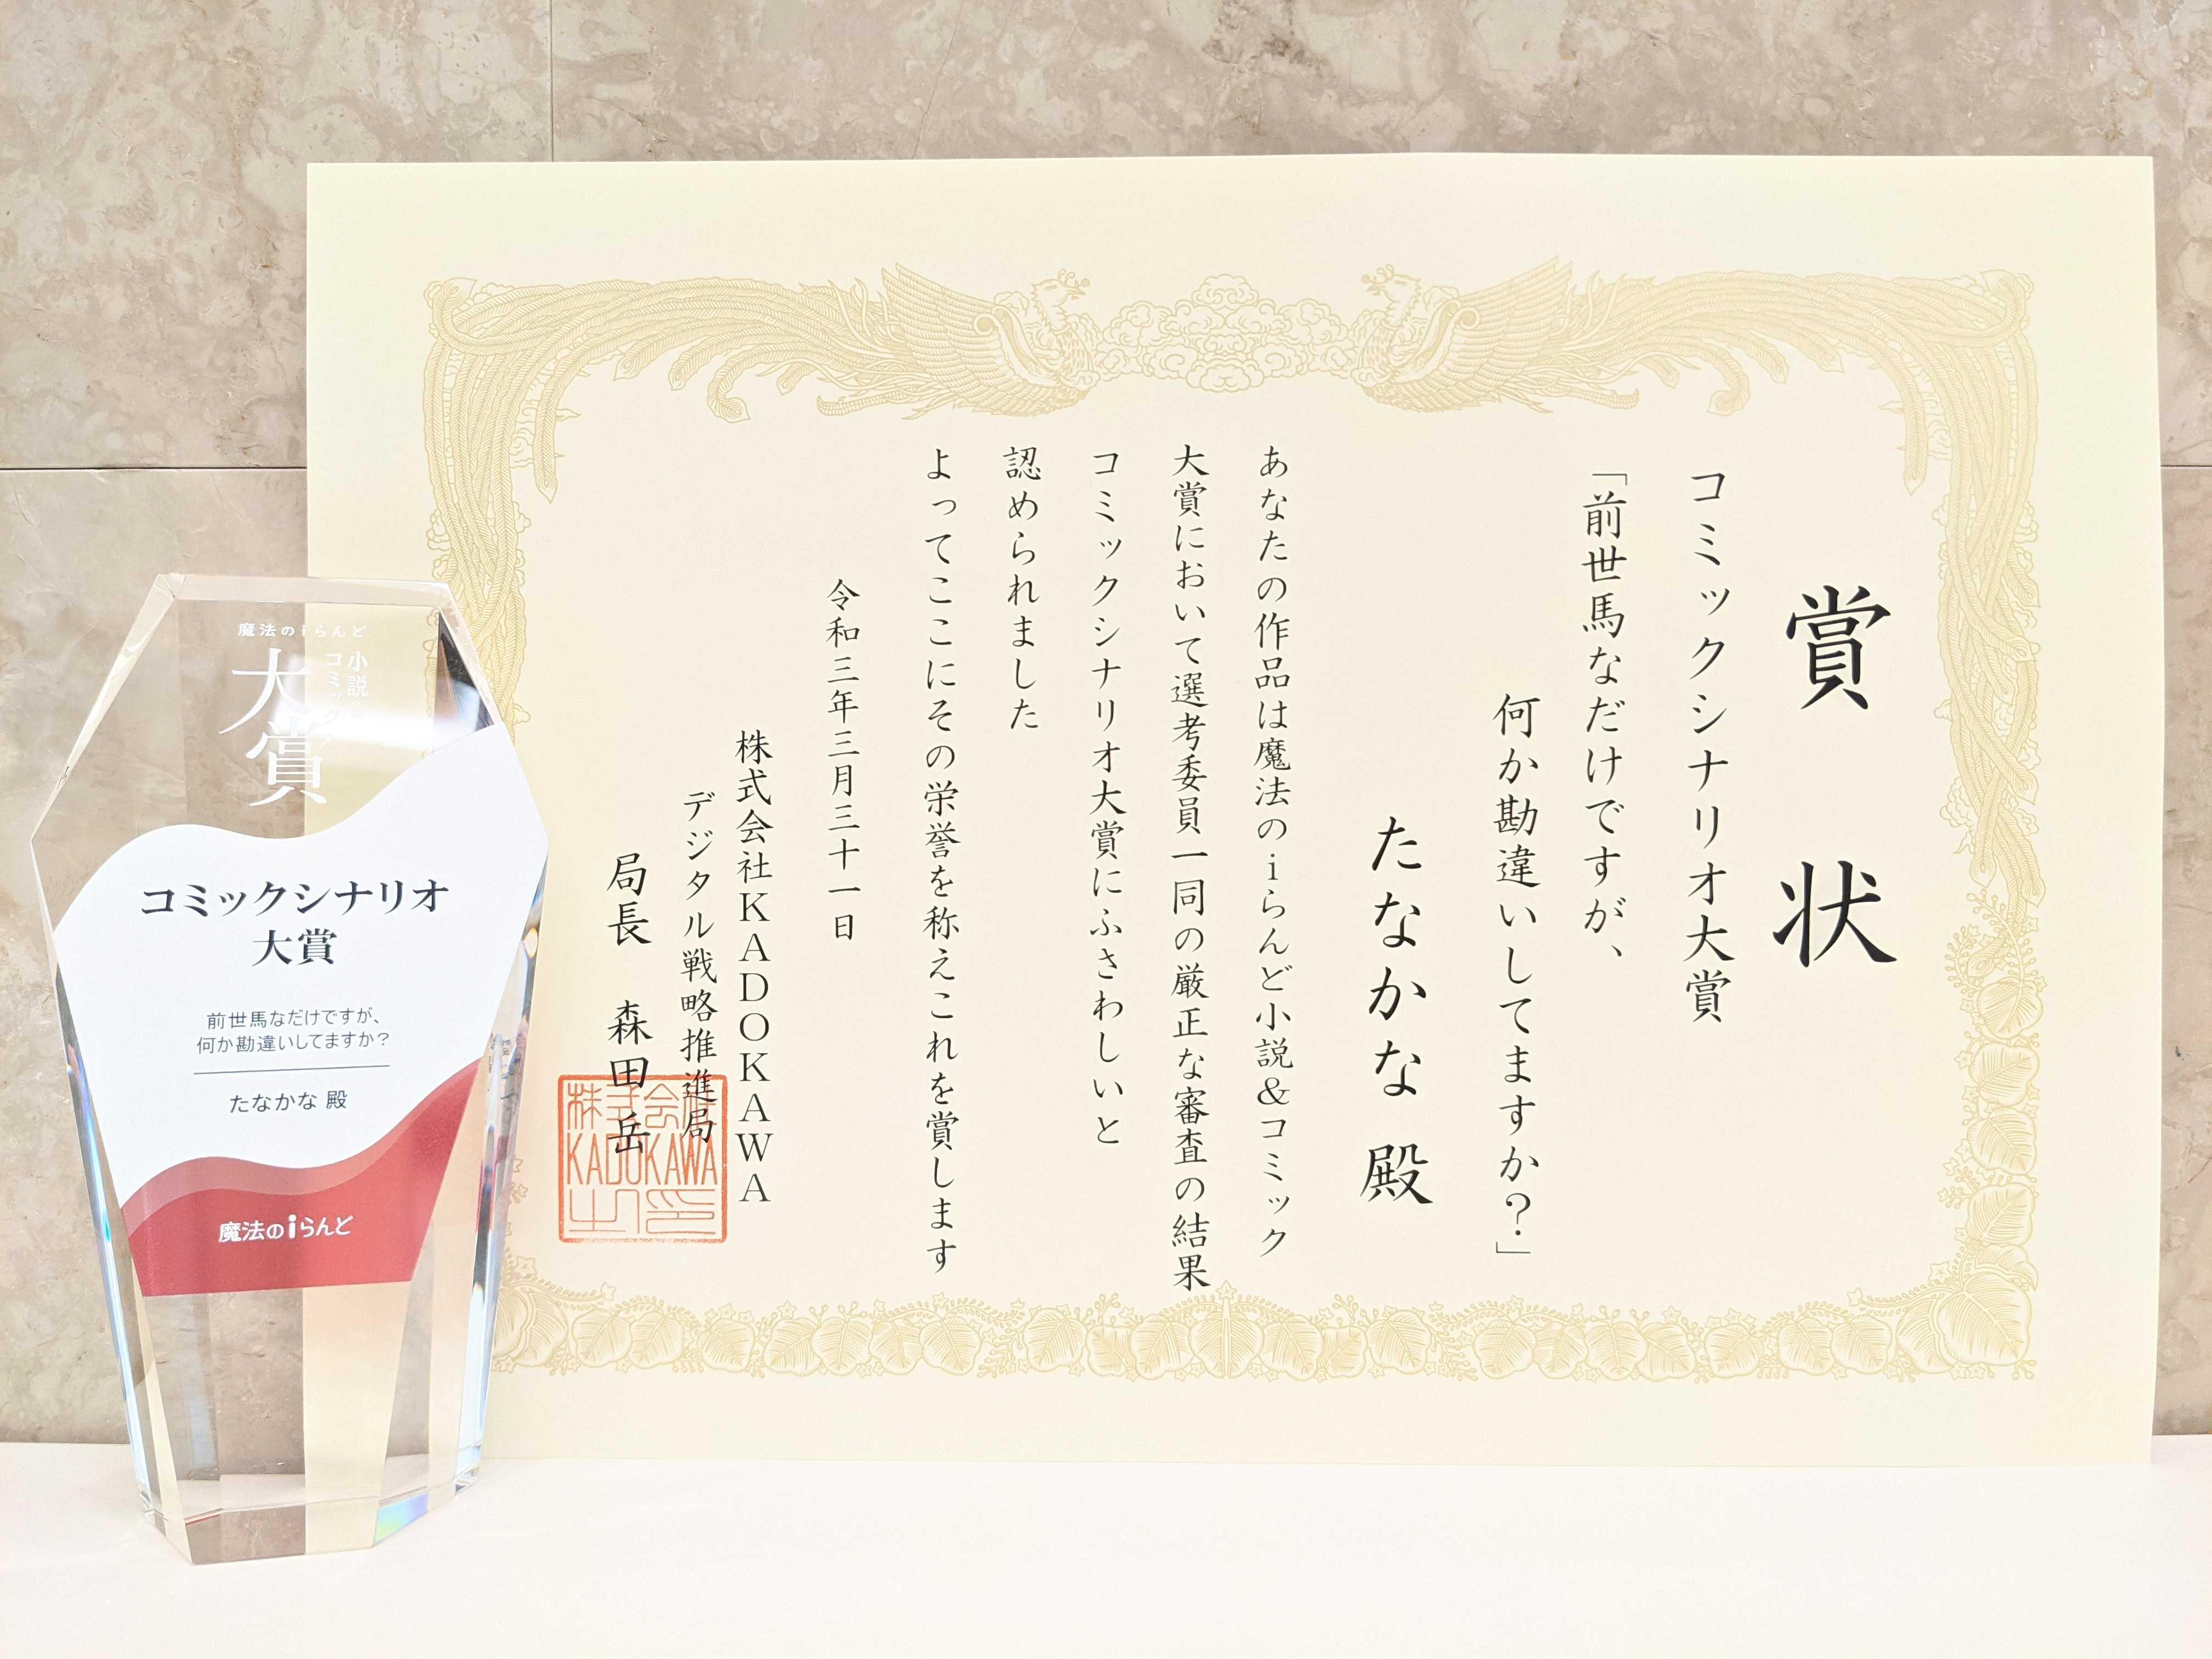 https://storage.googleapis.com/blog-info/entry/2021/06/senario_maho_award.jpg